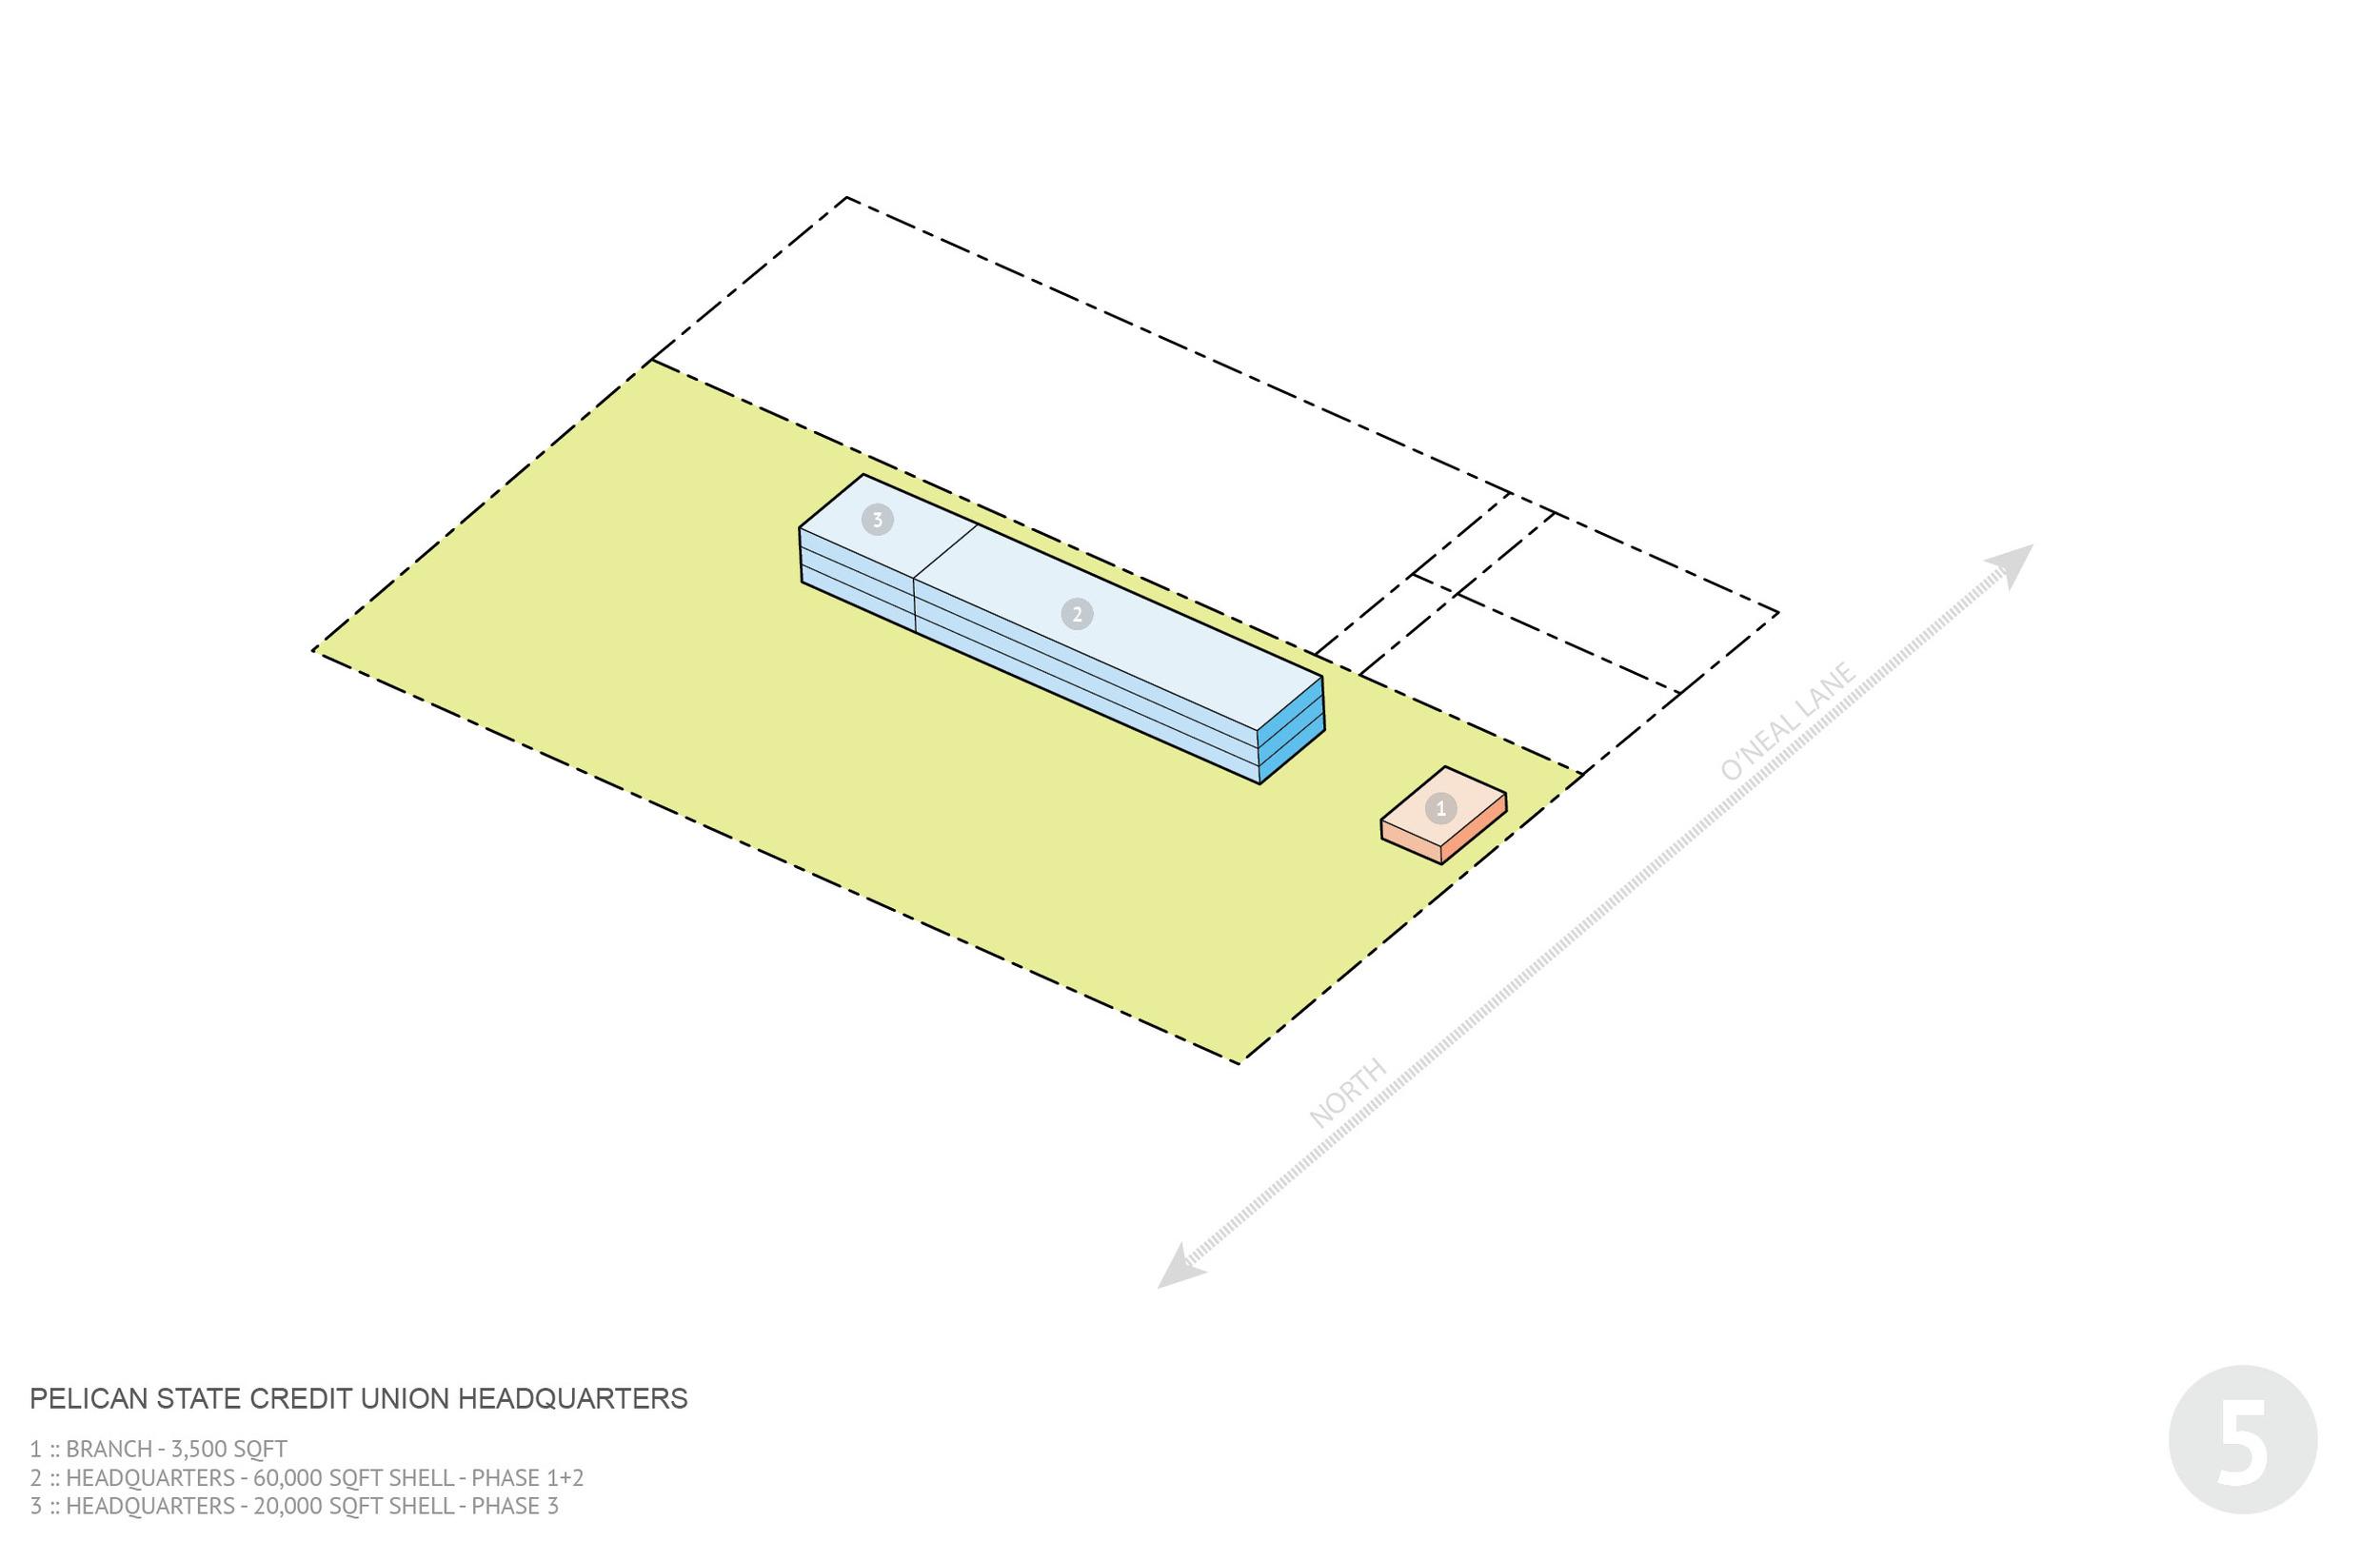 A_SlideshowDiagram_5.jpg